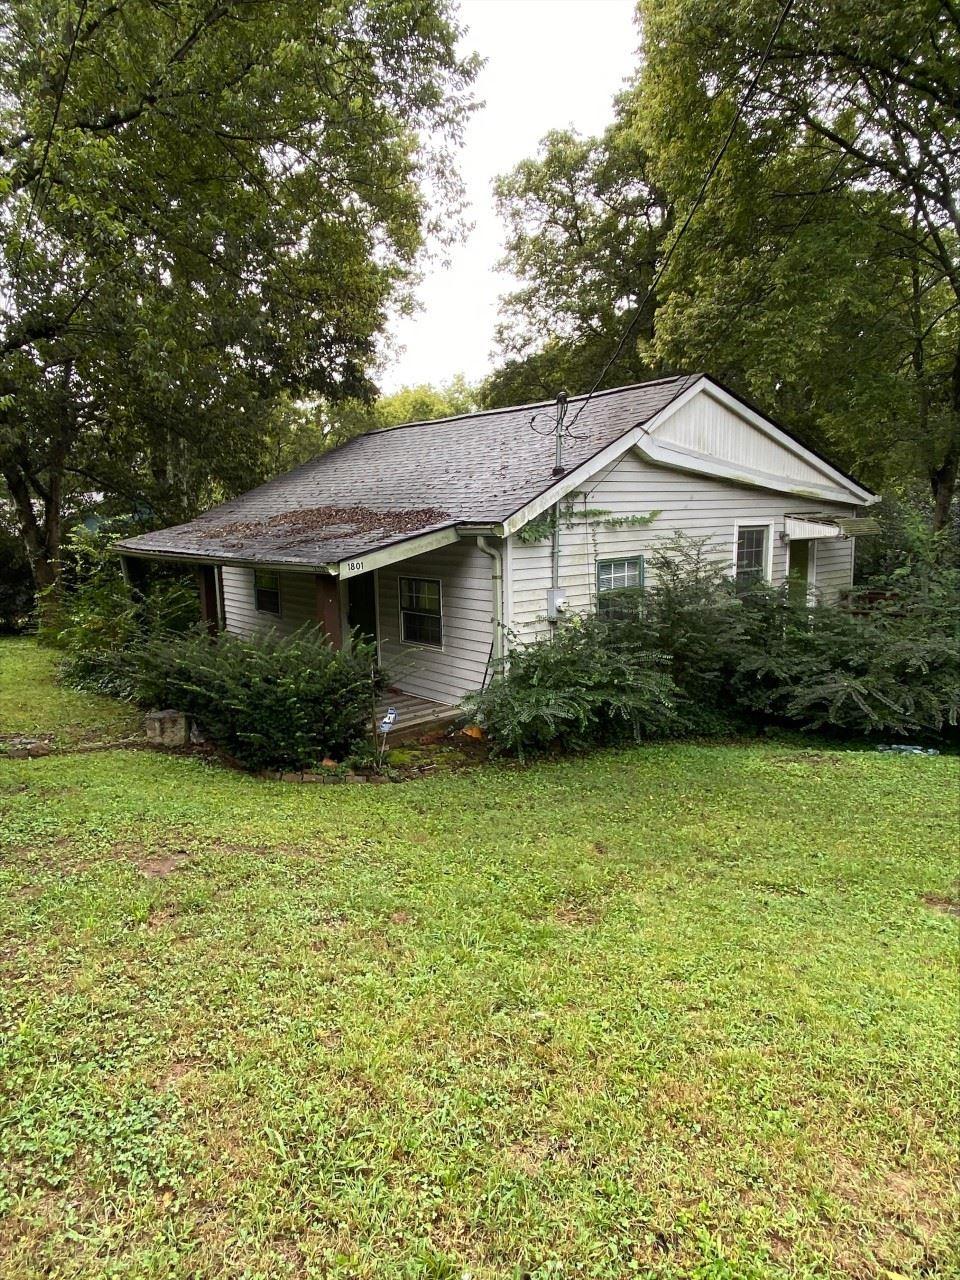 1801 Seminary St, Nashville, TN 37207 - MLS#: 2291911